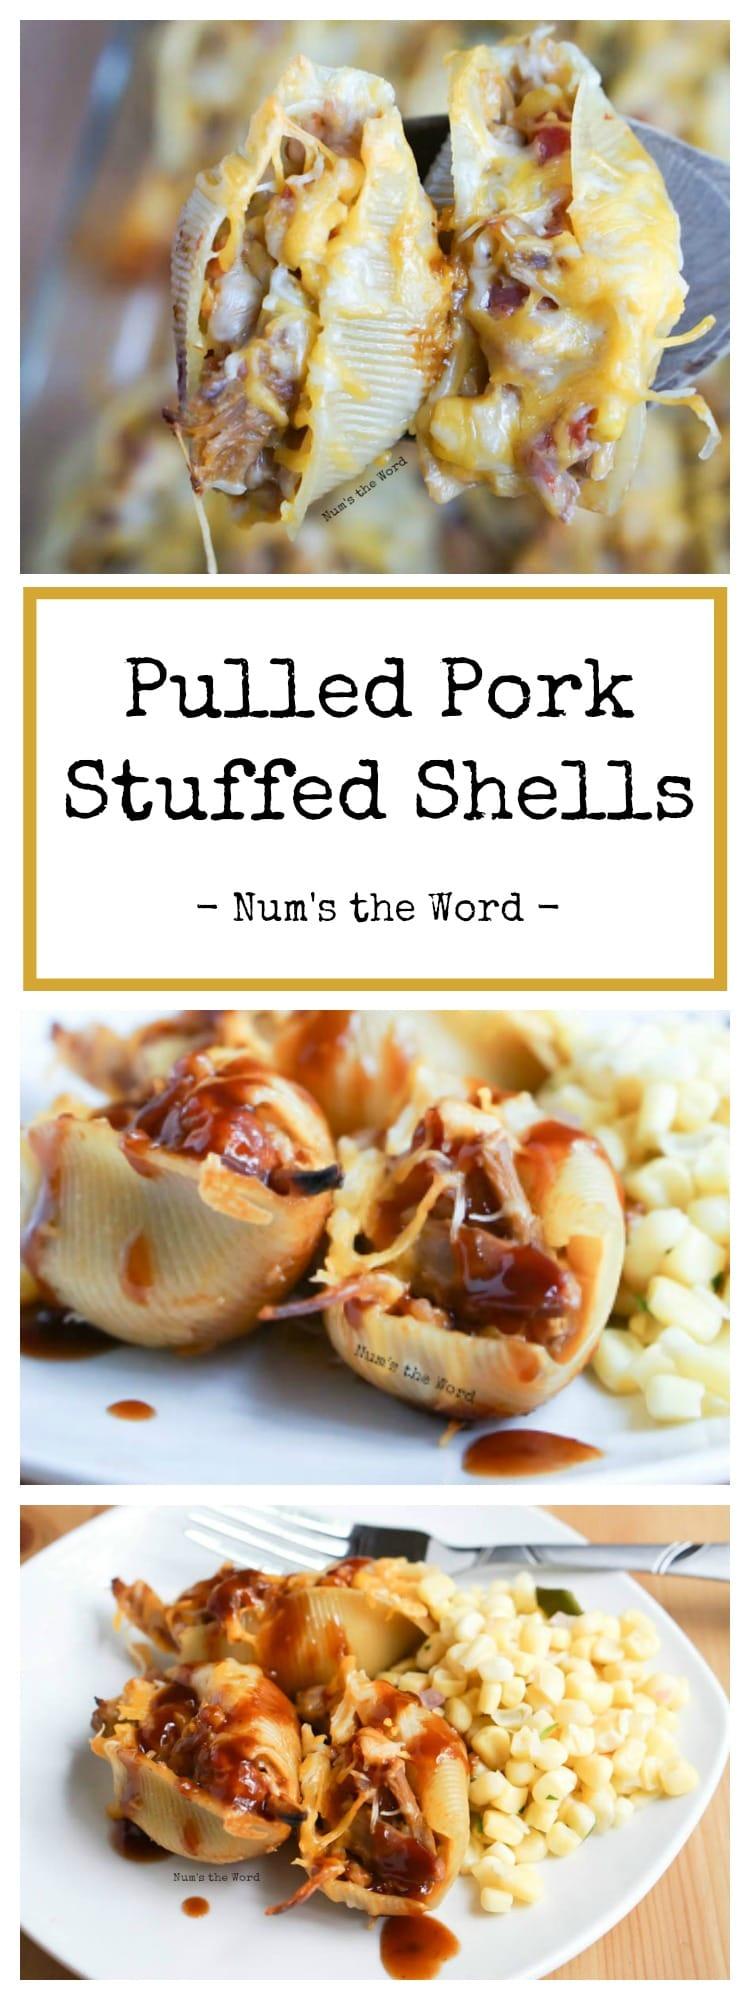 Pulled Pork Stuffed Shells